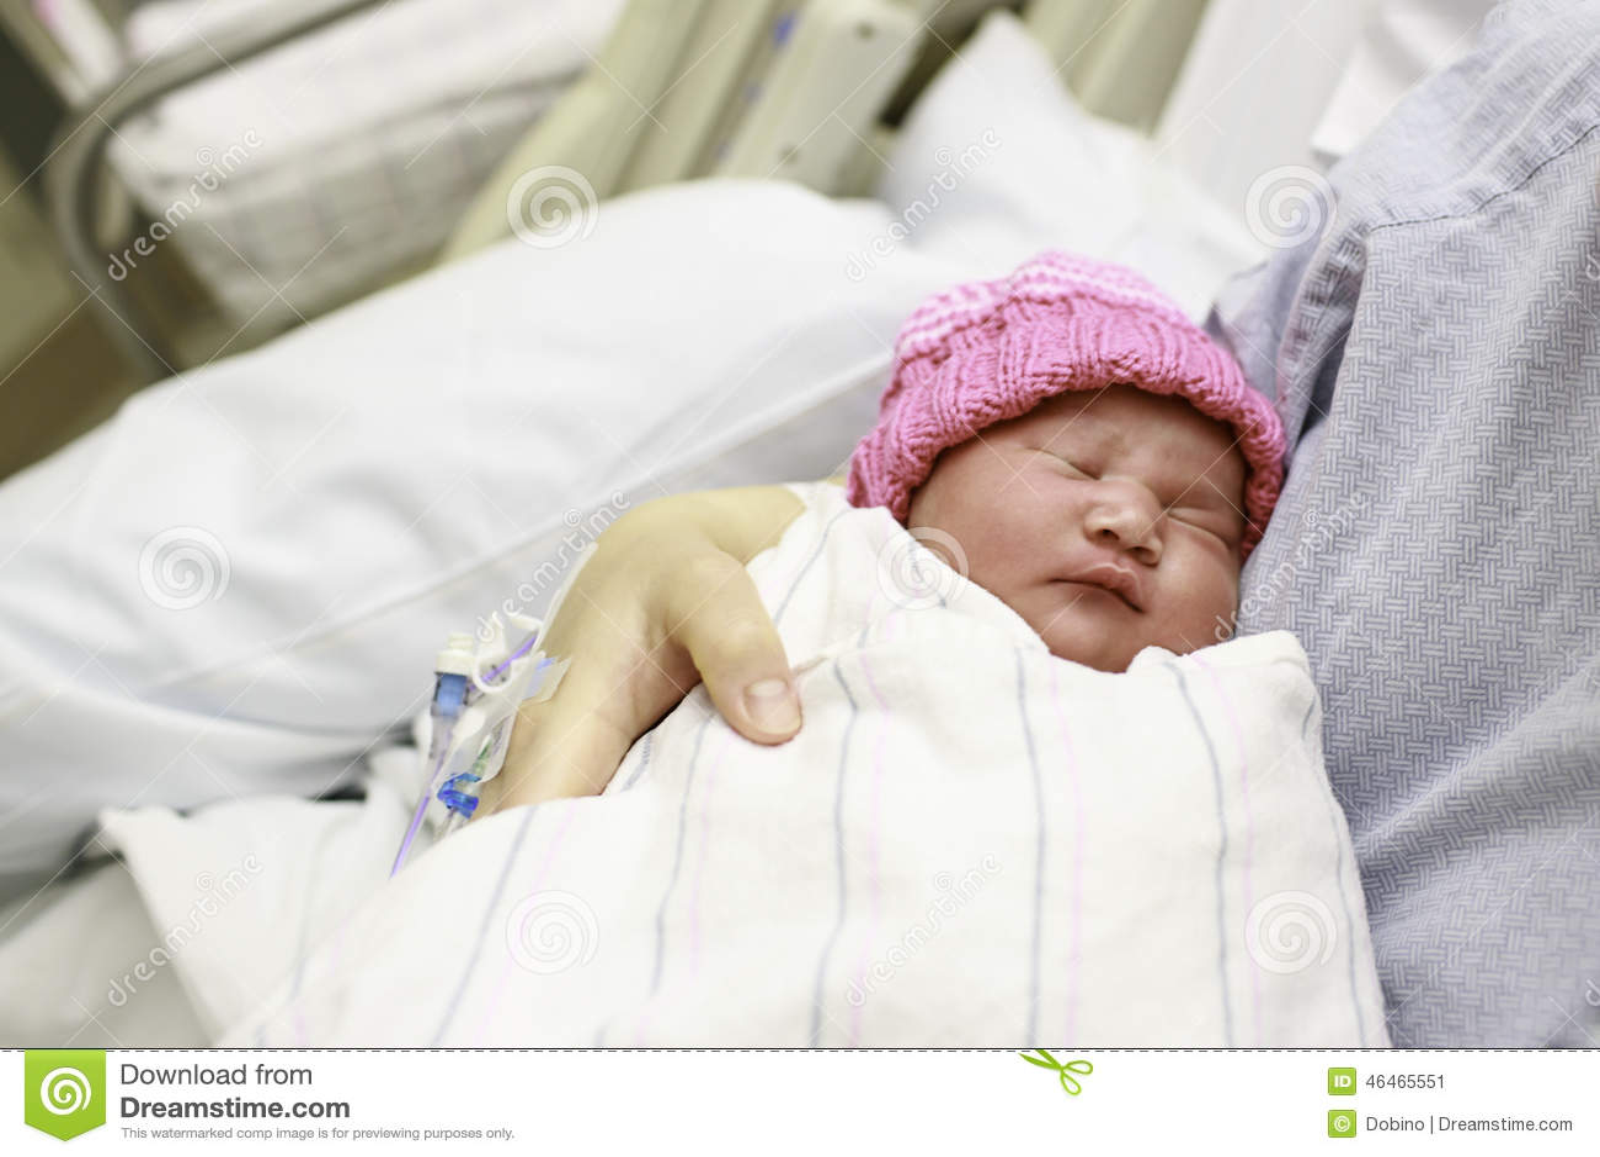 Newborn Baby In The Hospital Stock Photo - Image: 46465551